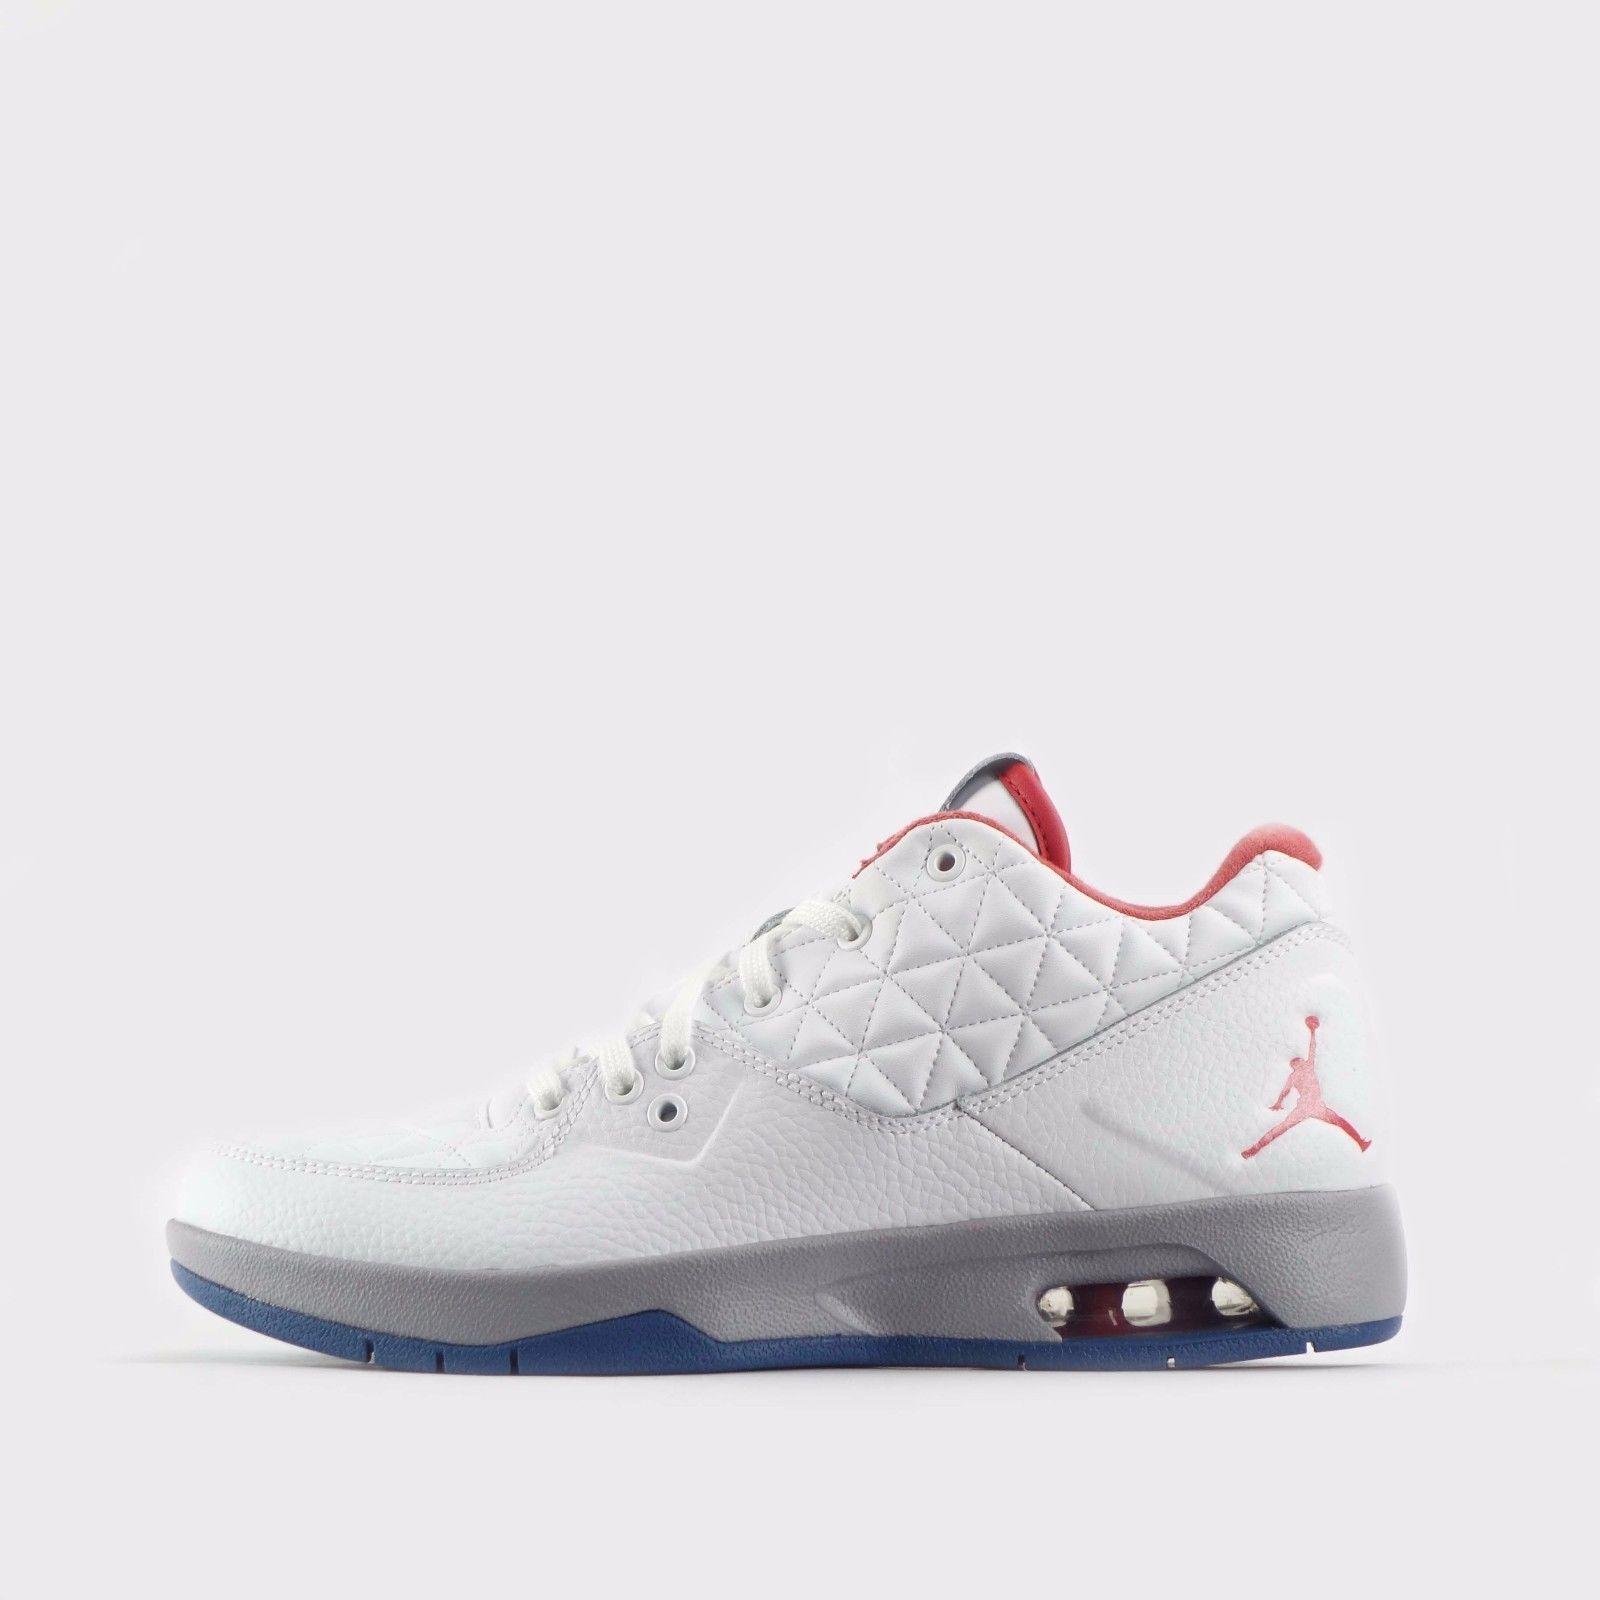 Nike Jordan Clutch Hommes 7 Eur 41 blanc  Basketball Sneaker Authentic Hommes